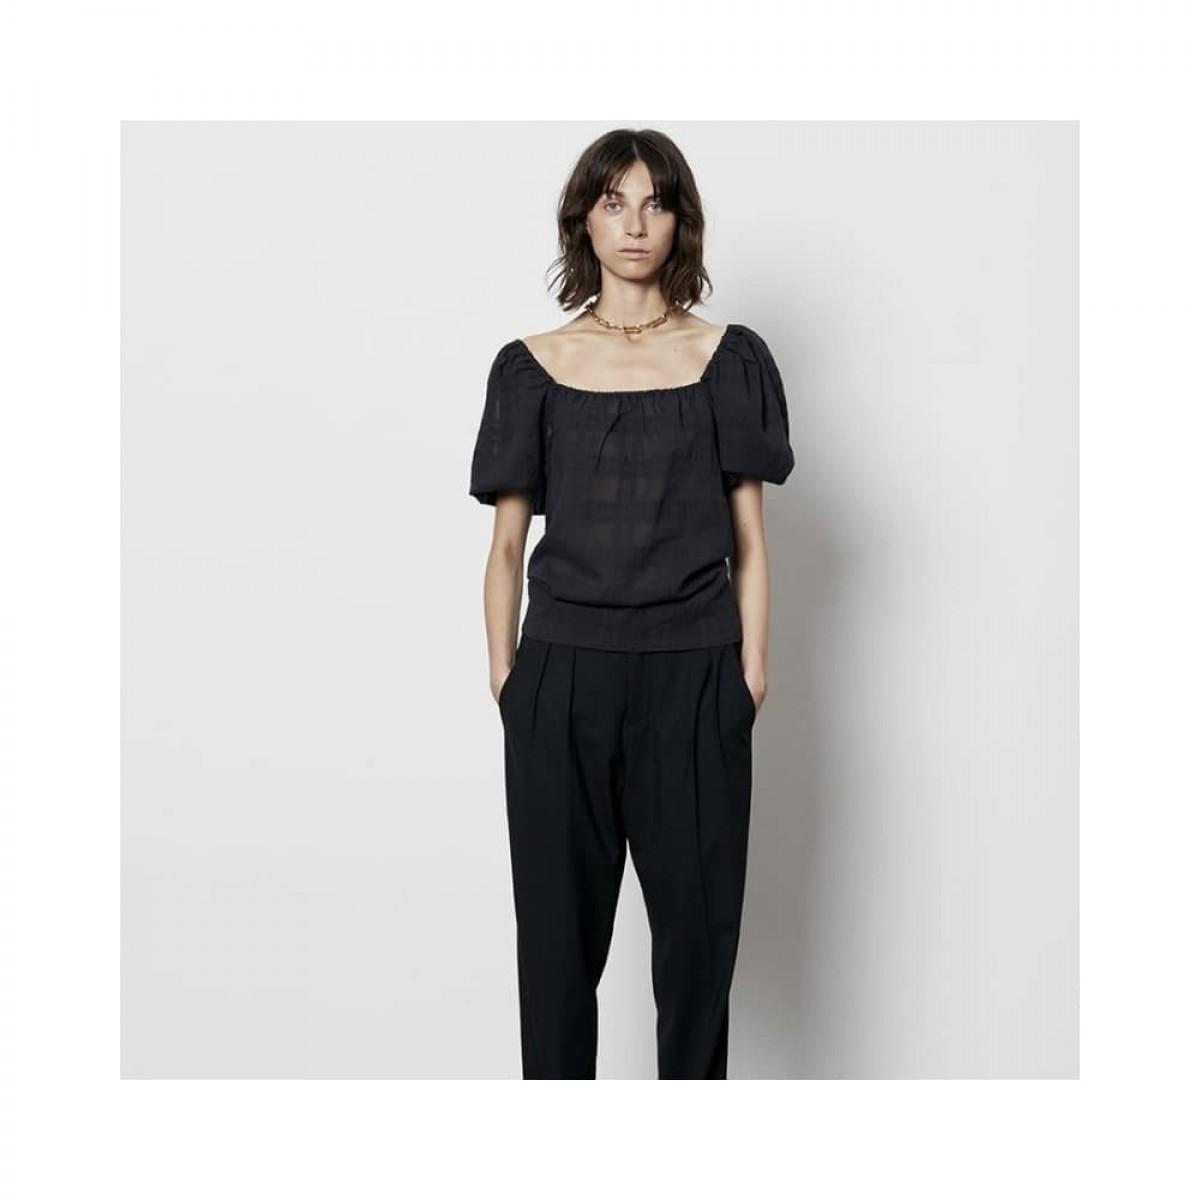 flo shirt top - black